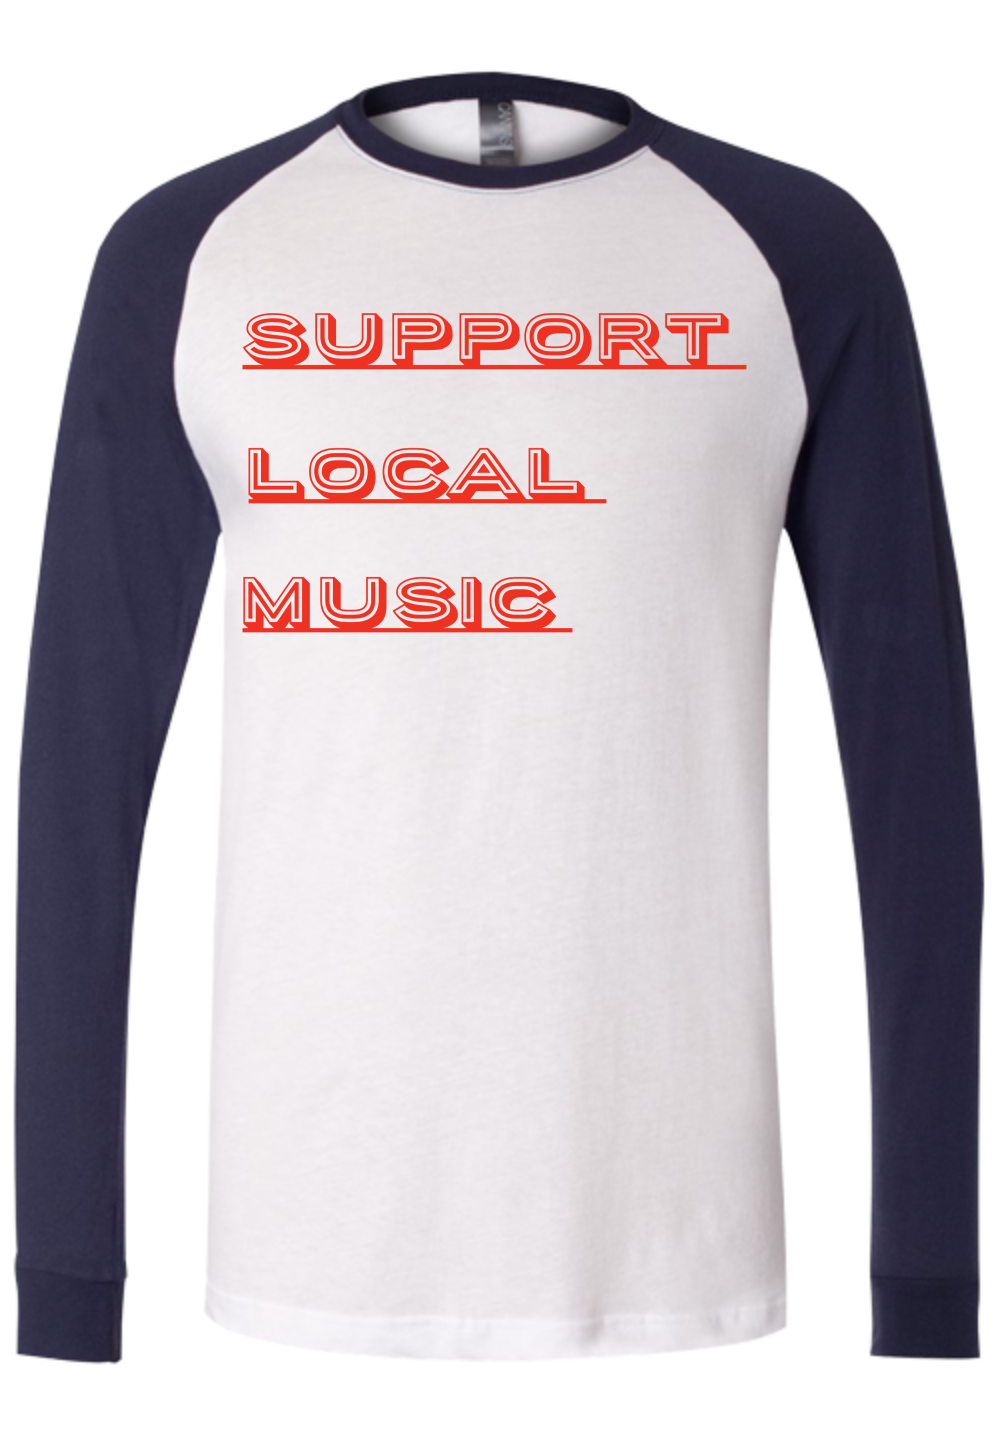 Support Local Music  Long Sleeve Baseball Tee